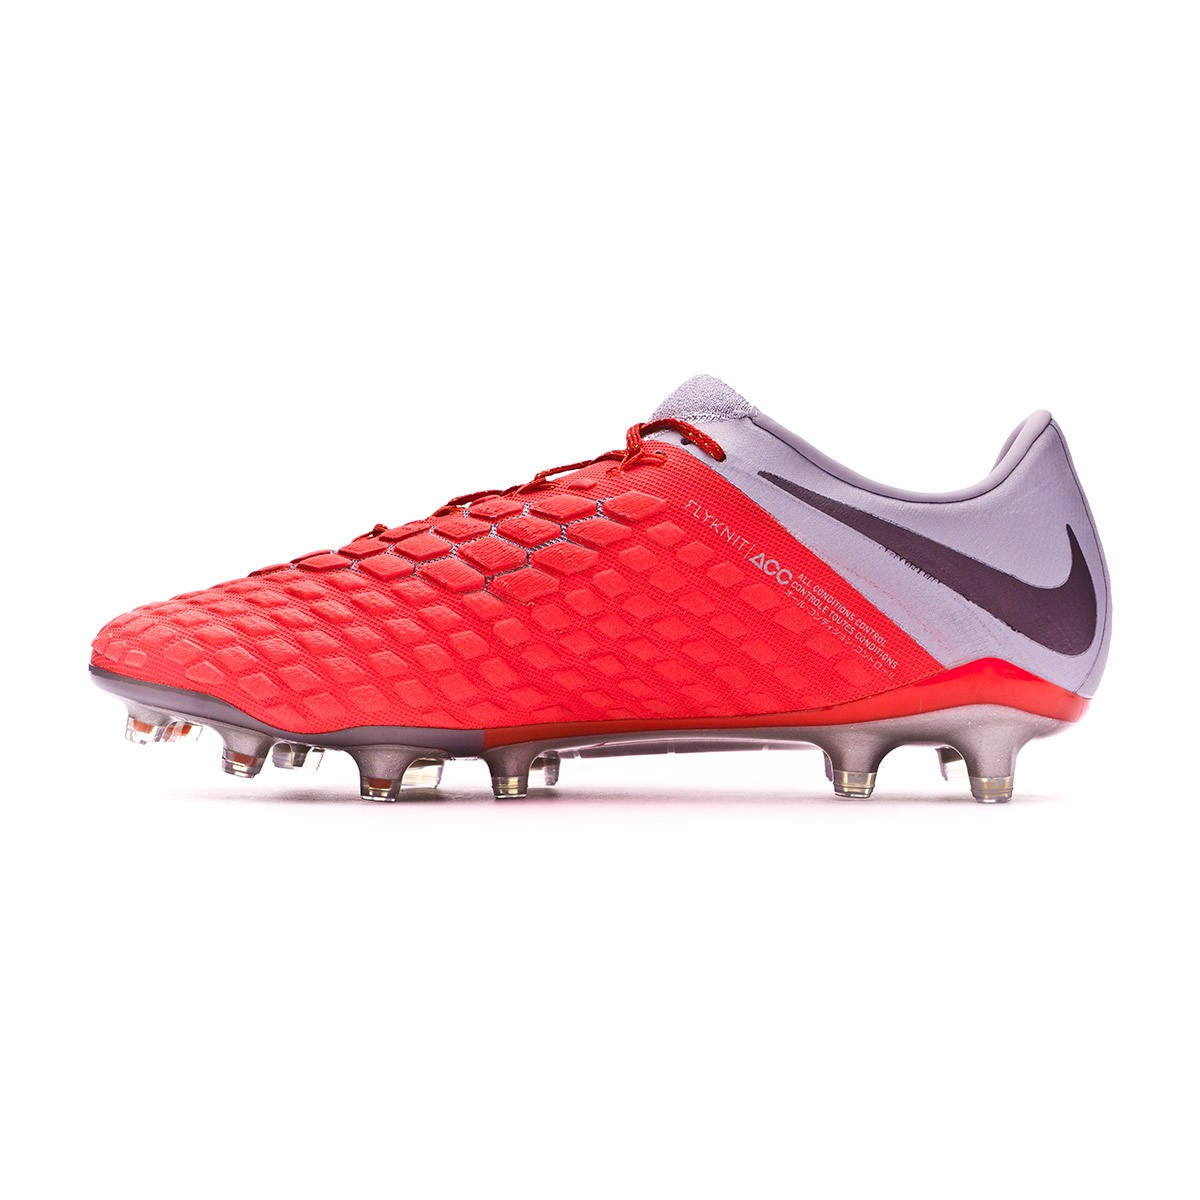 e37247e5a82 Football Boots Nike Hypervenom Phantom III Elite FG Light crimson-Metallic  dark grey-Wolf grey - Tienda de fútbol Fútbol Emotion